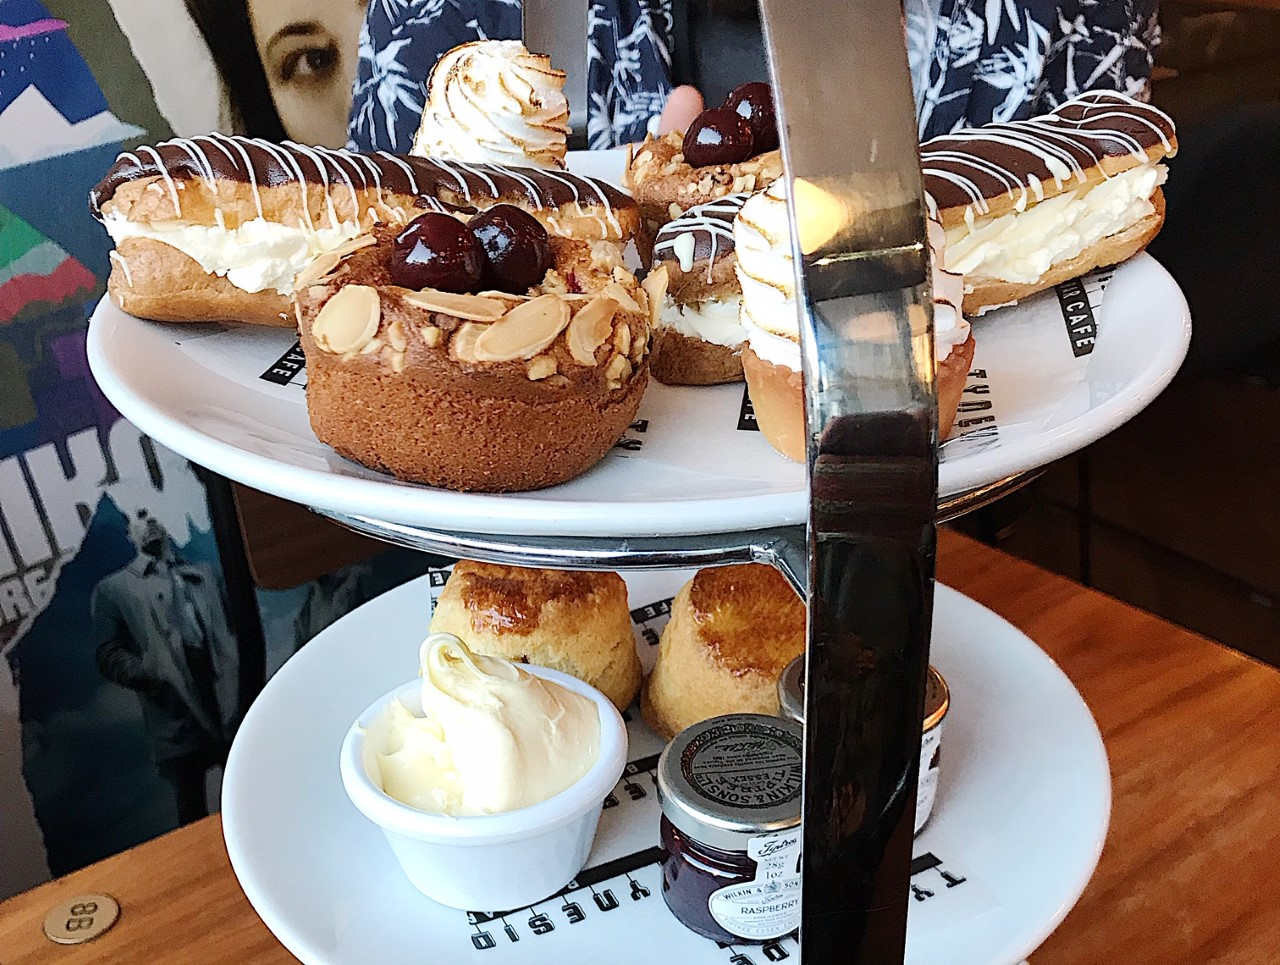 A selection of sweet treats at Tyneside Bar Café